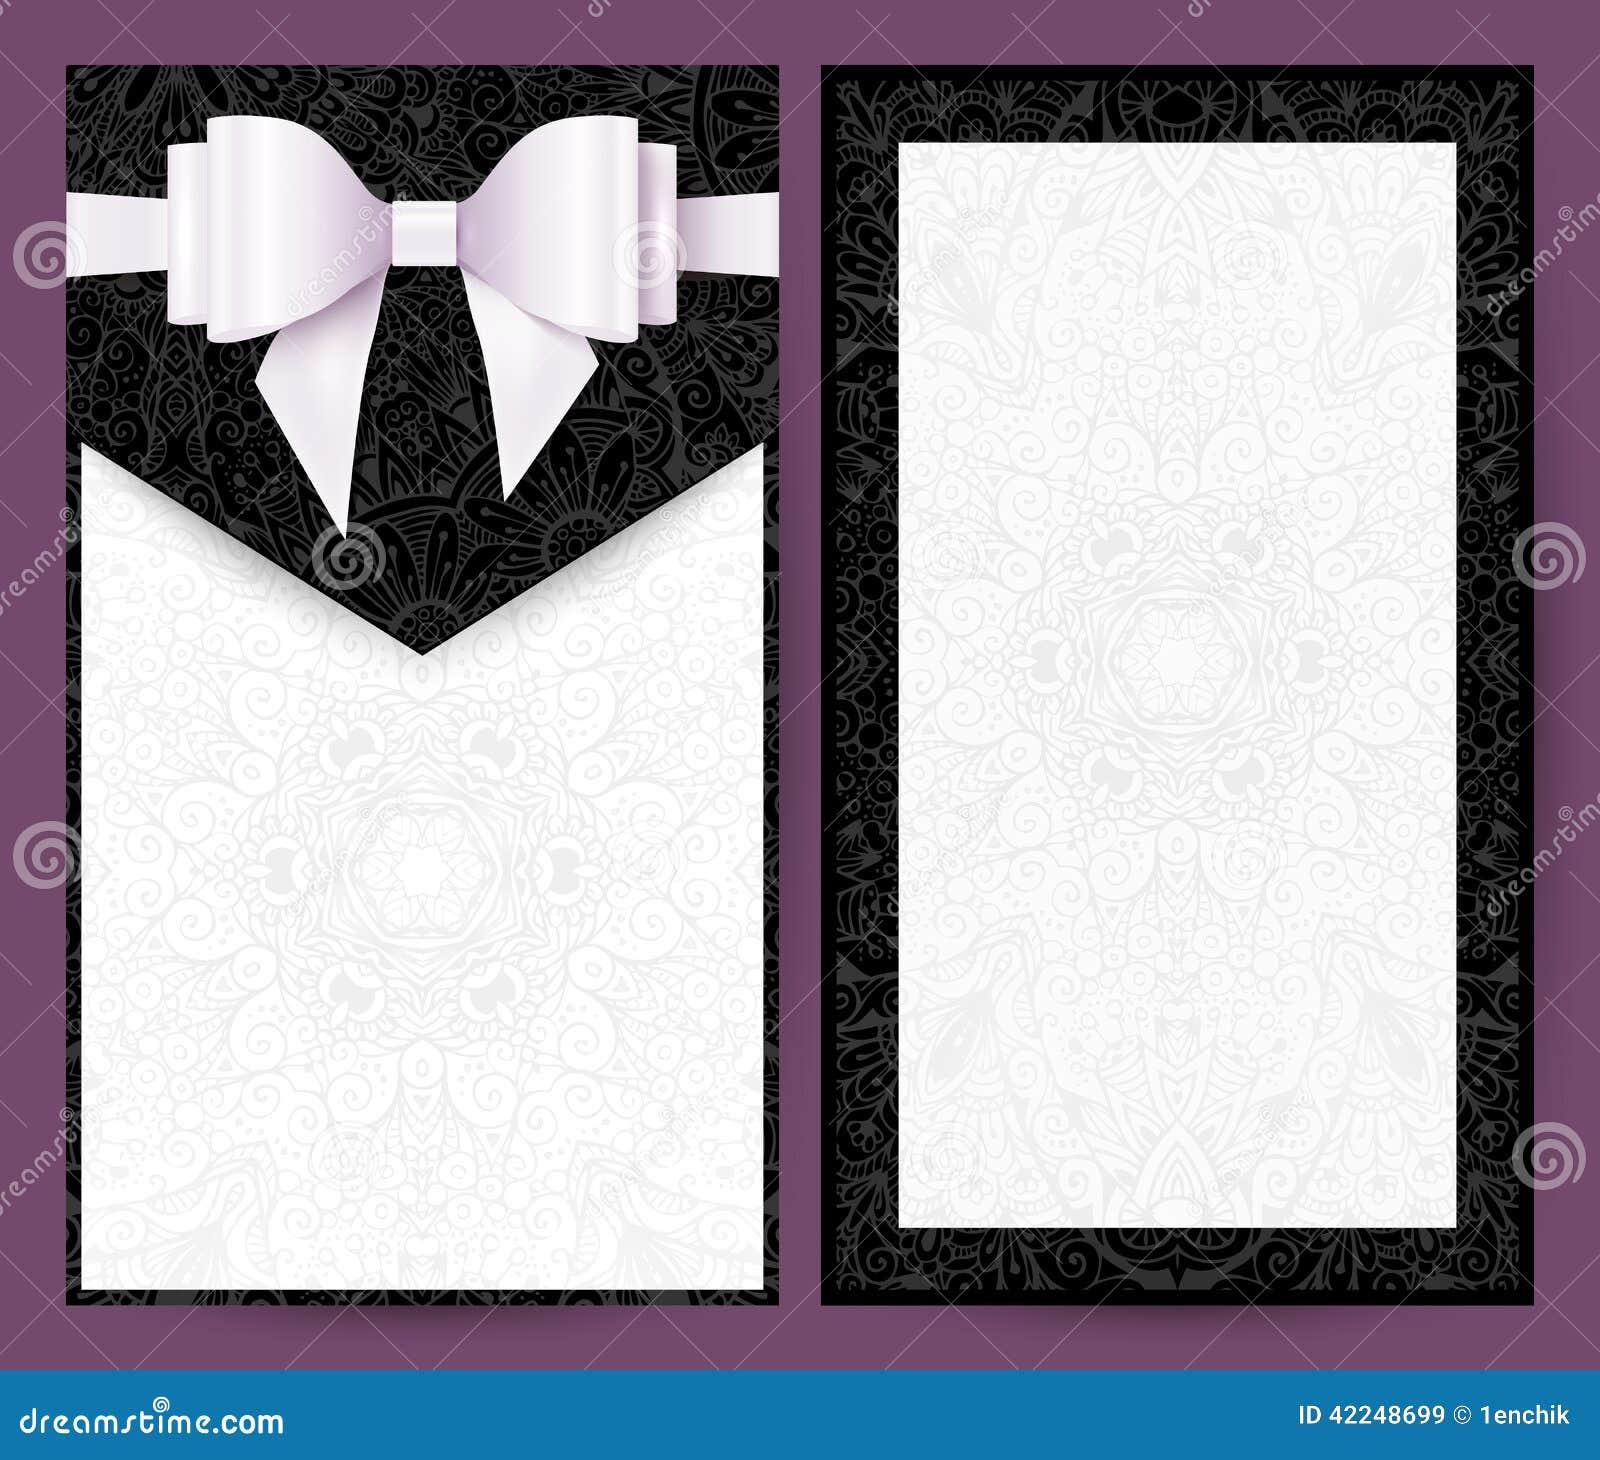 Elegant Black And White Vector Wedding Invitation Stock Vector ...